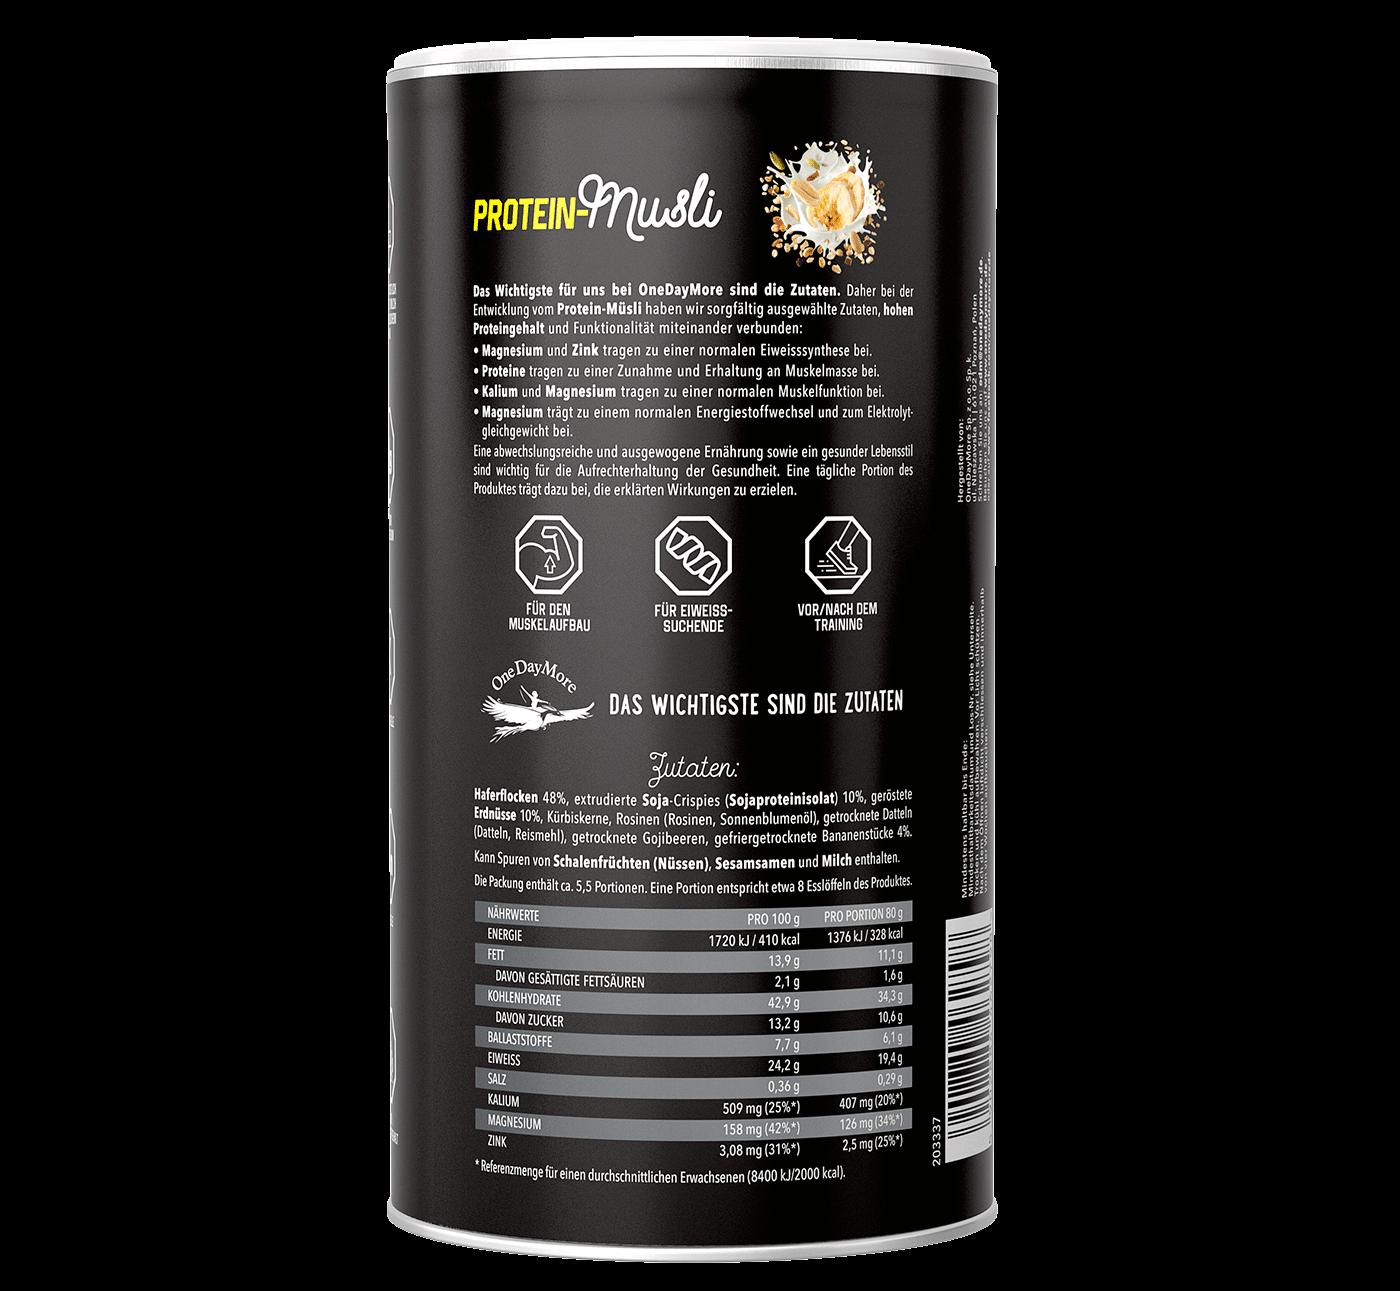 protein-musli-onedaymore-tyl-tuba-1400×1291